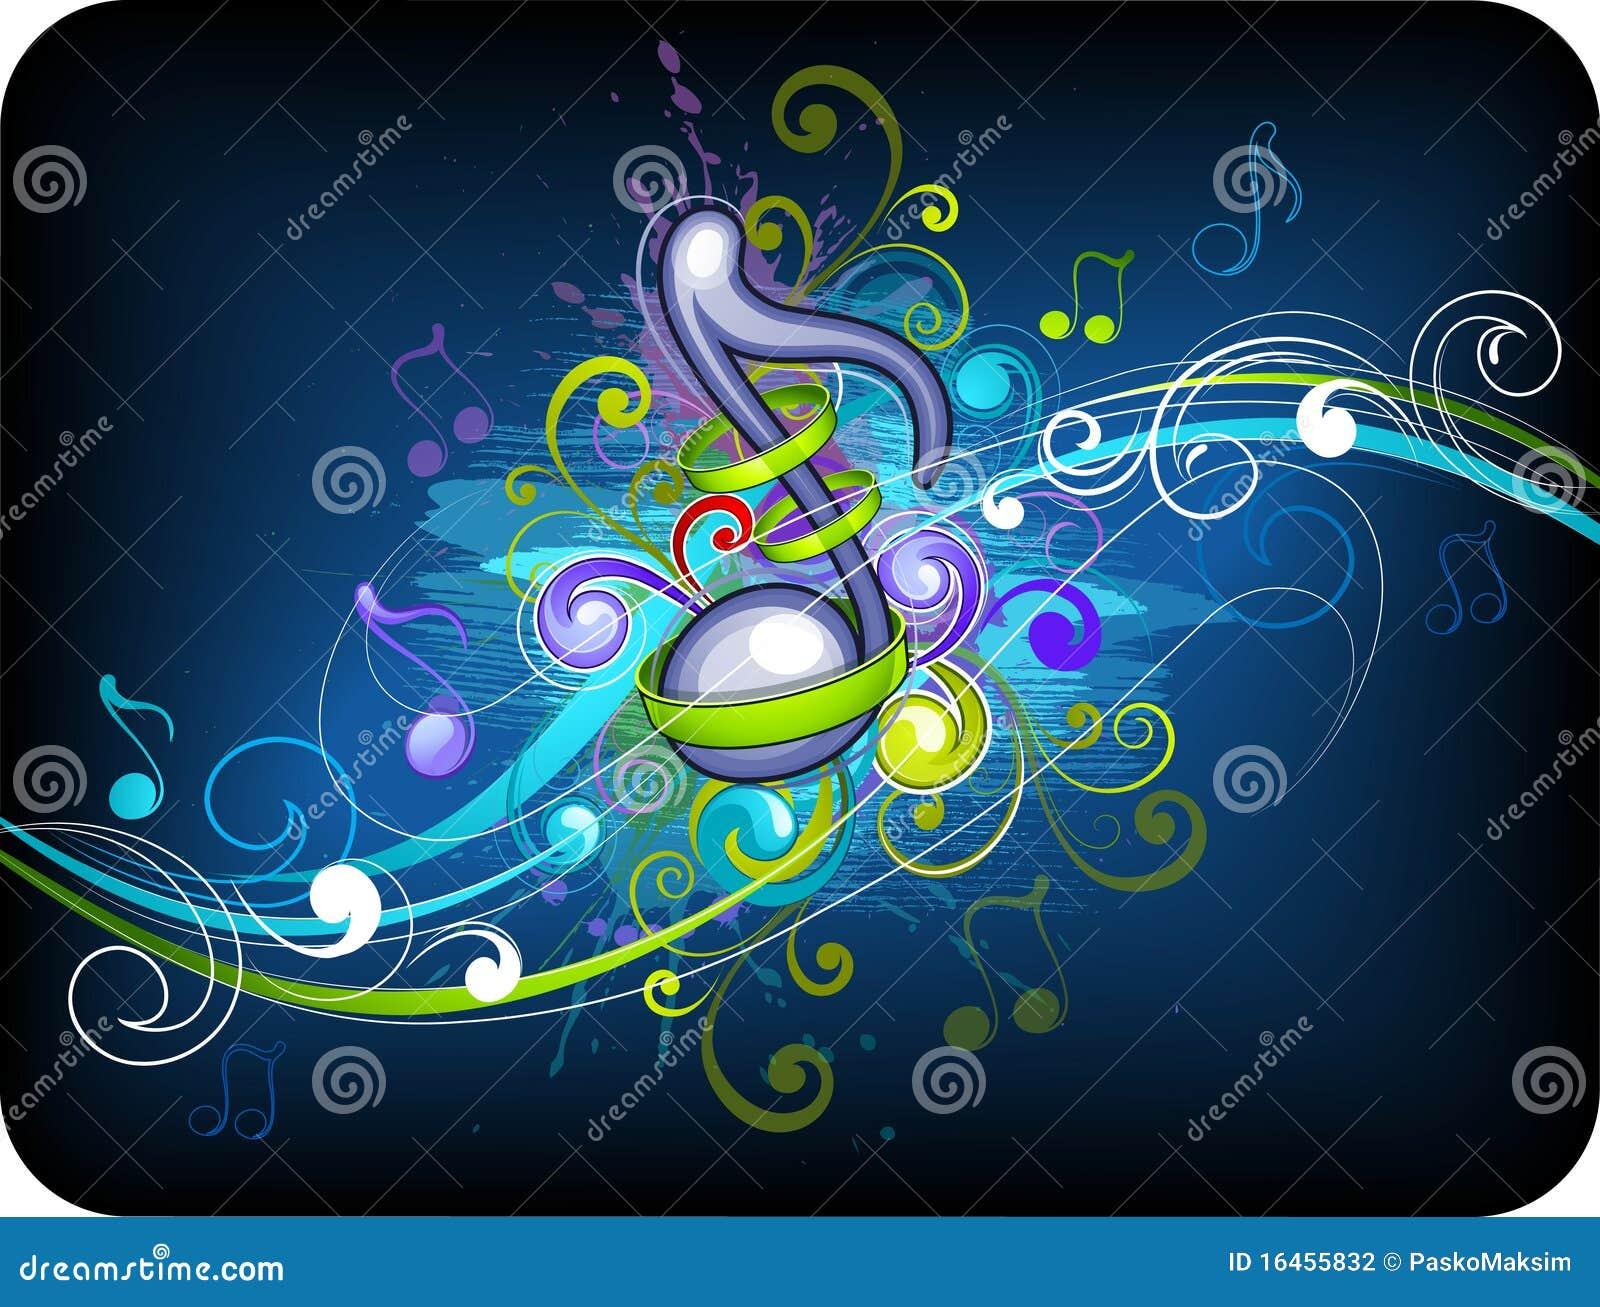 Music Background Design Stock Photography - Image: 16455832